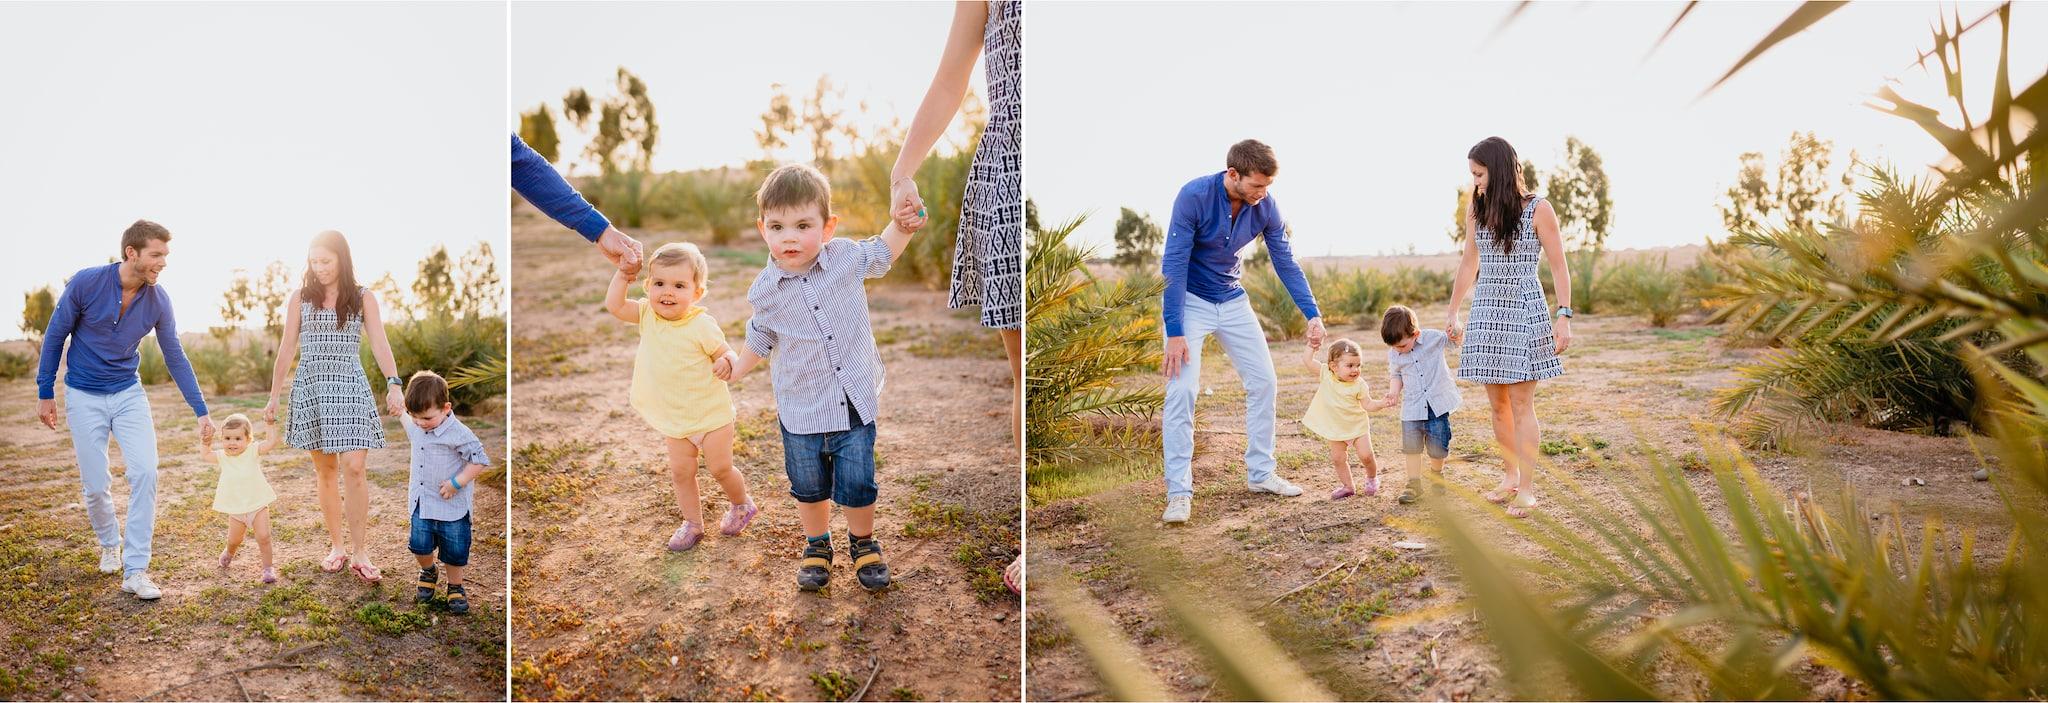 photographe ; séance photo famille